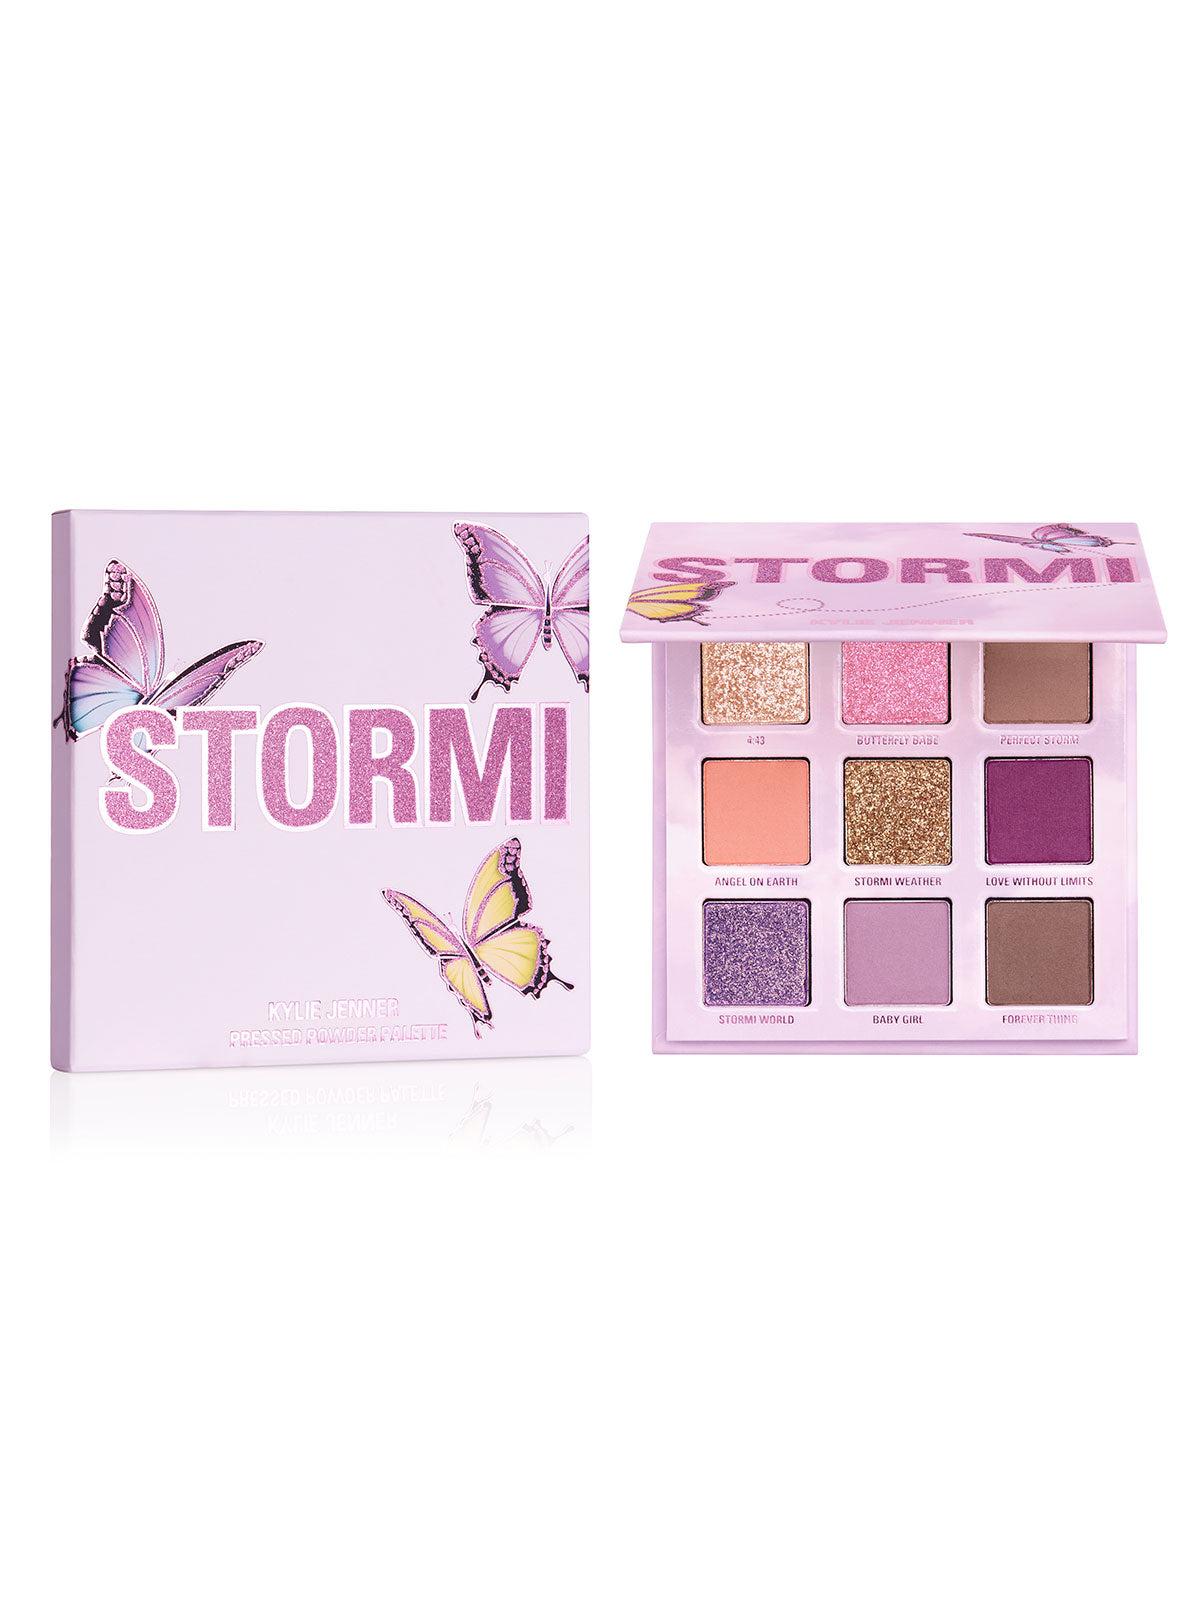 kyliecosmetics.com - Stormi Mini Palette